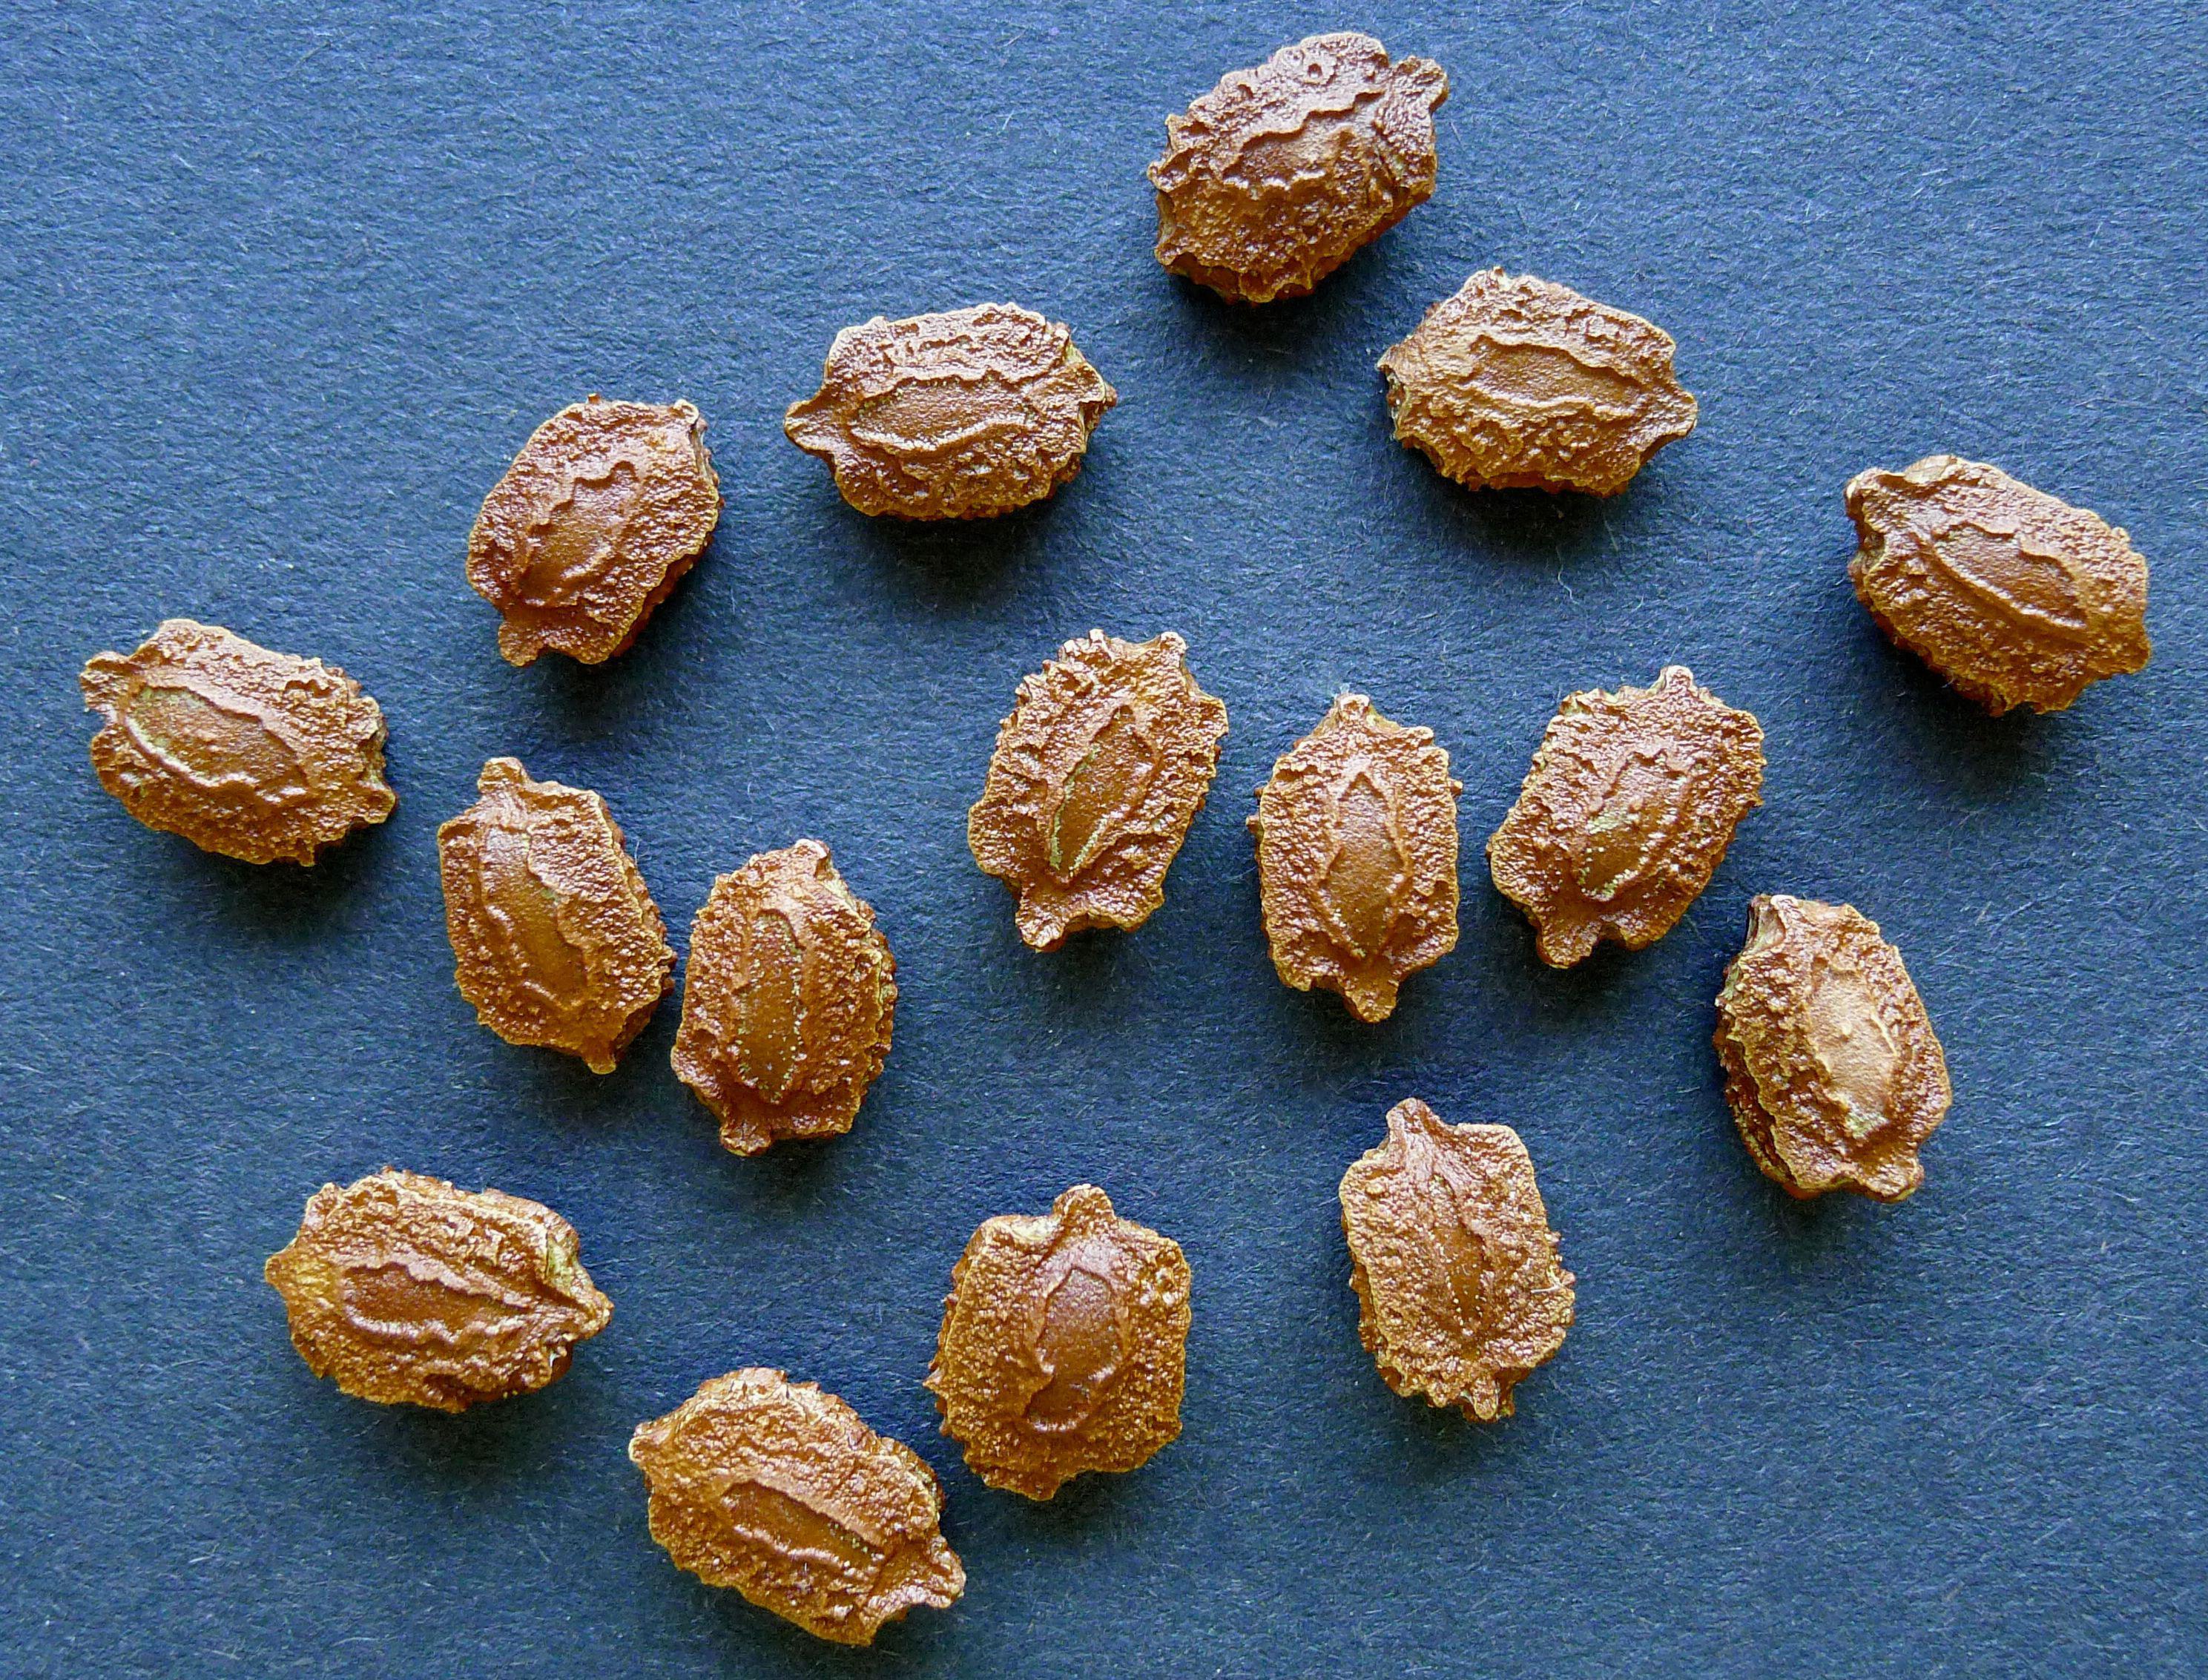 Seeds-of-Balsam-apple